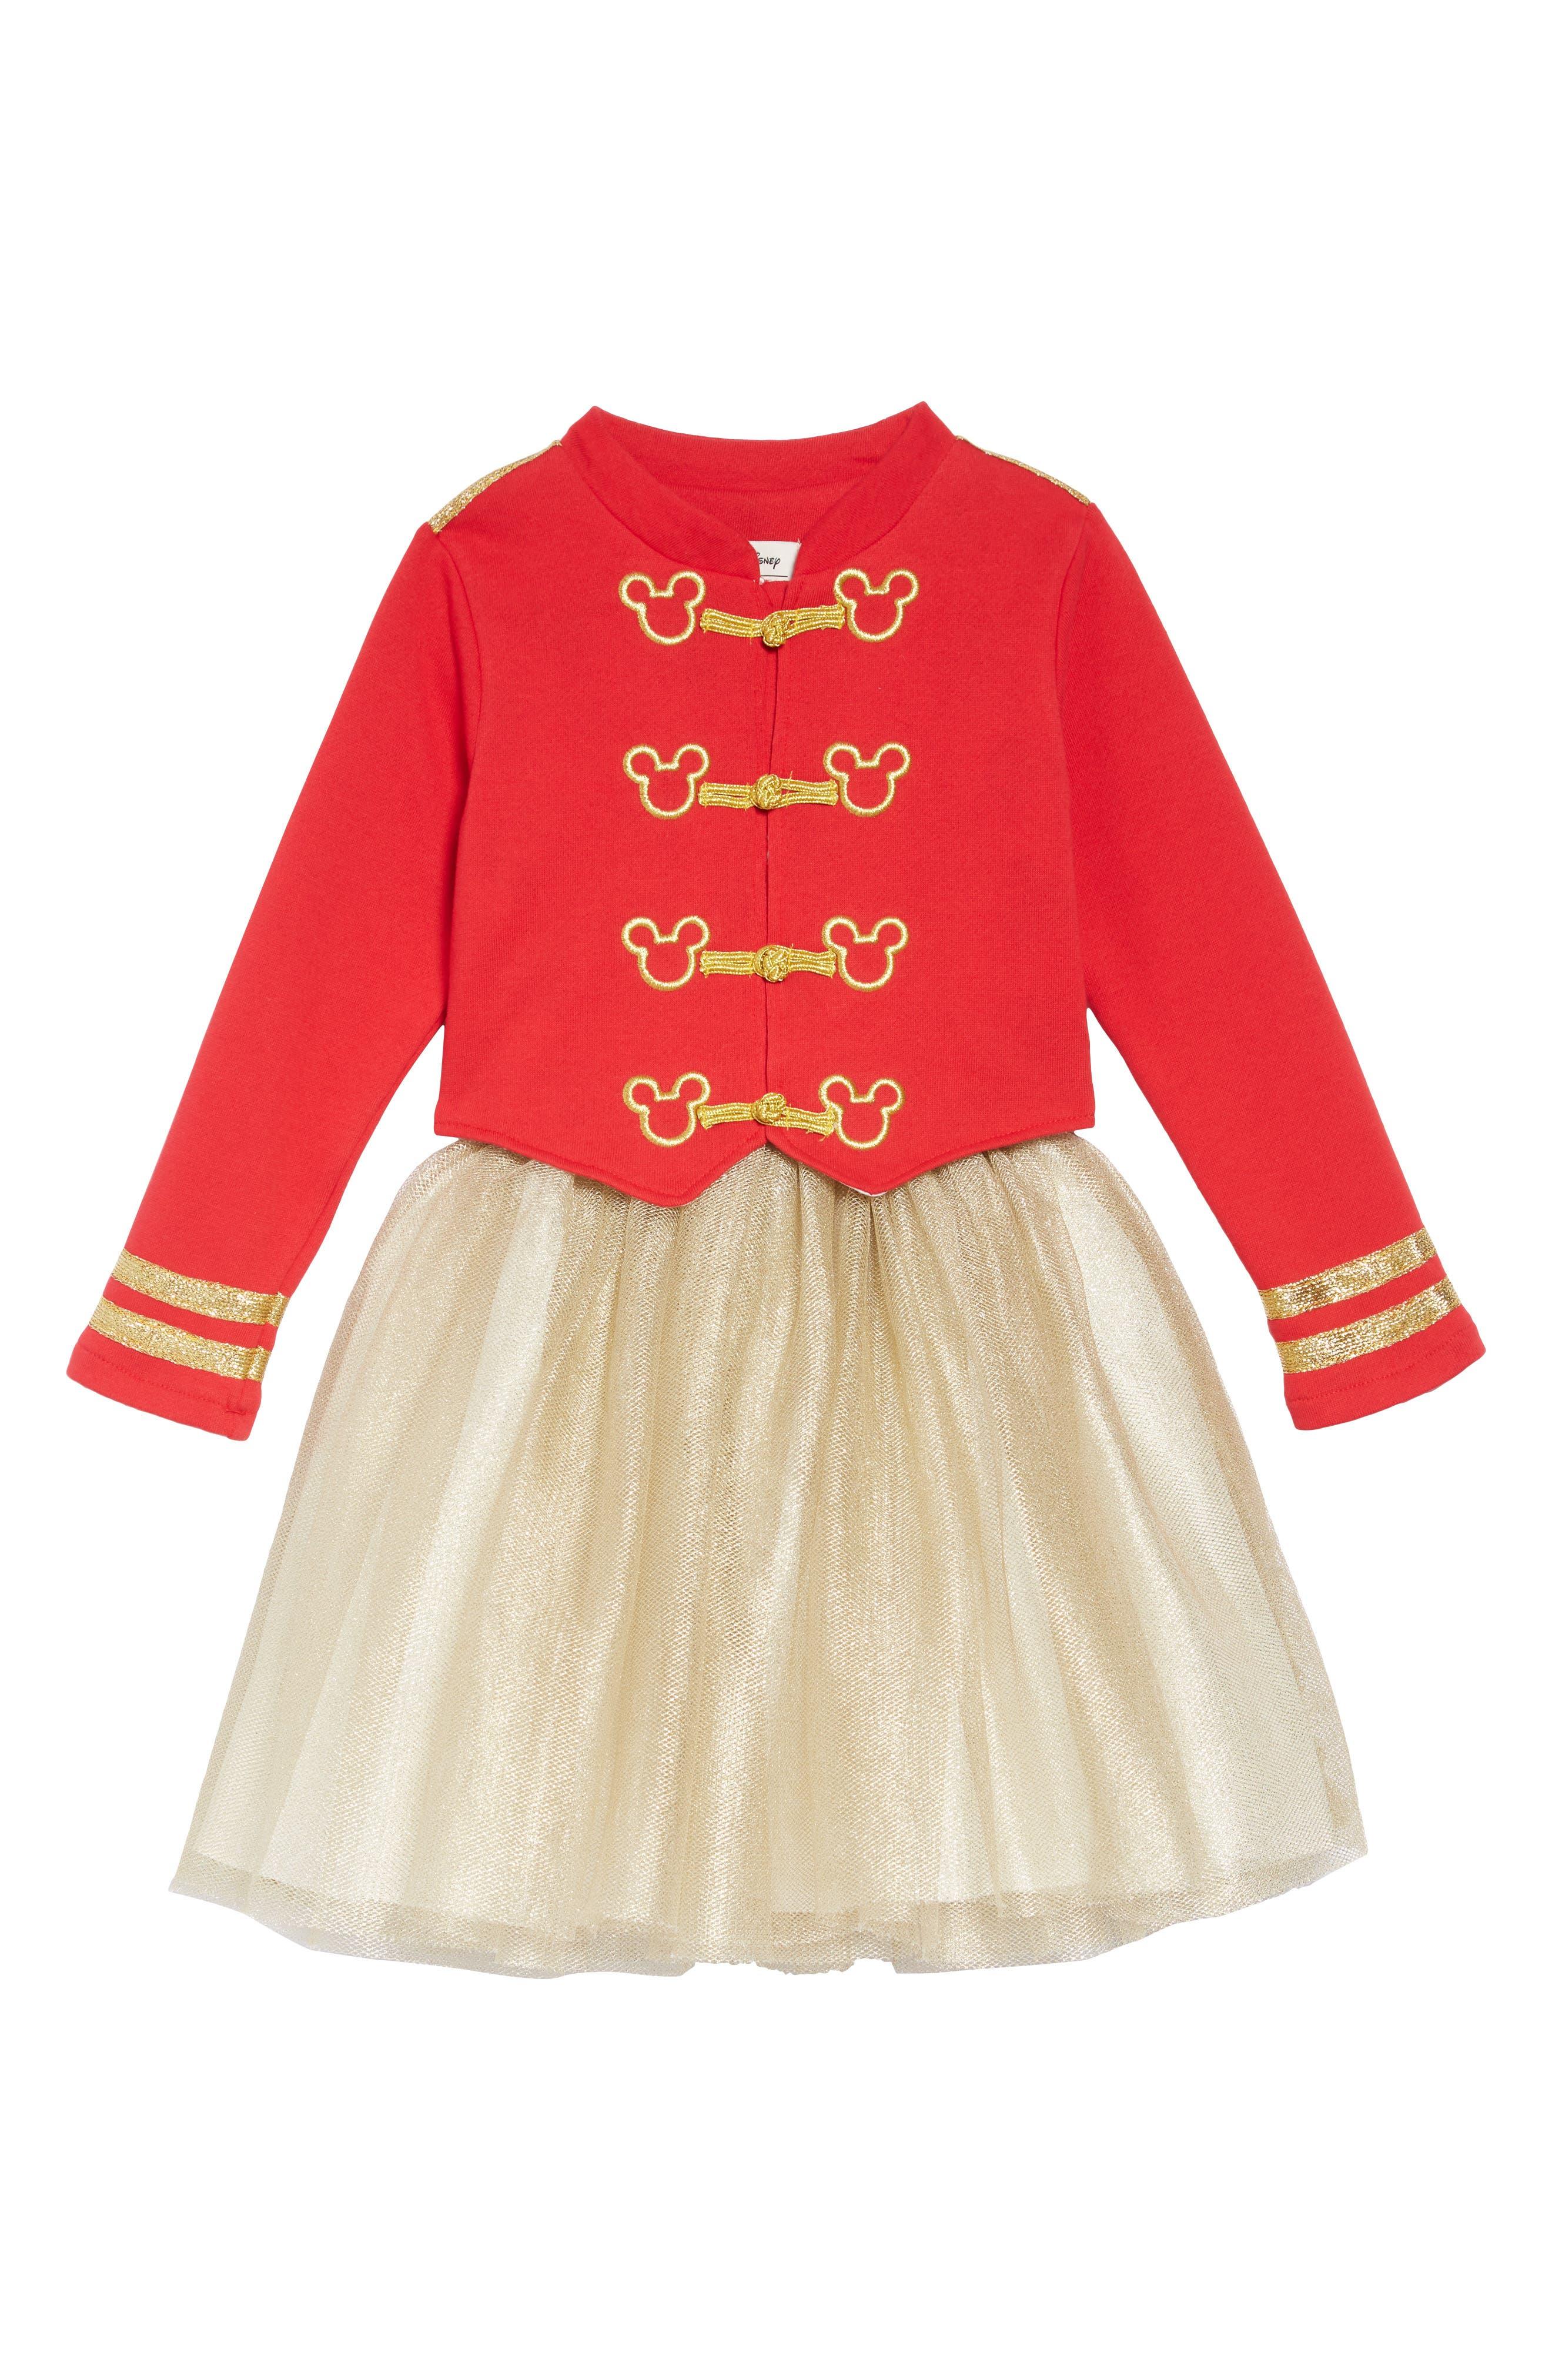 PIPPA & JULIE x Disney<sup>®</sup> Mickey Mouse<sup>®</sup> Majorette Jacket & Tank Dress Set, Main, color, 643